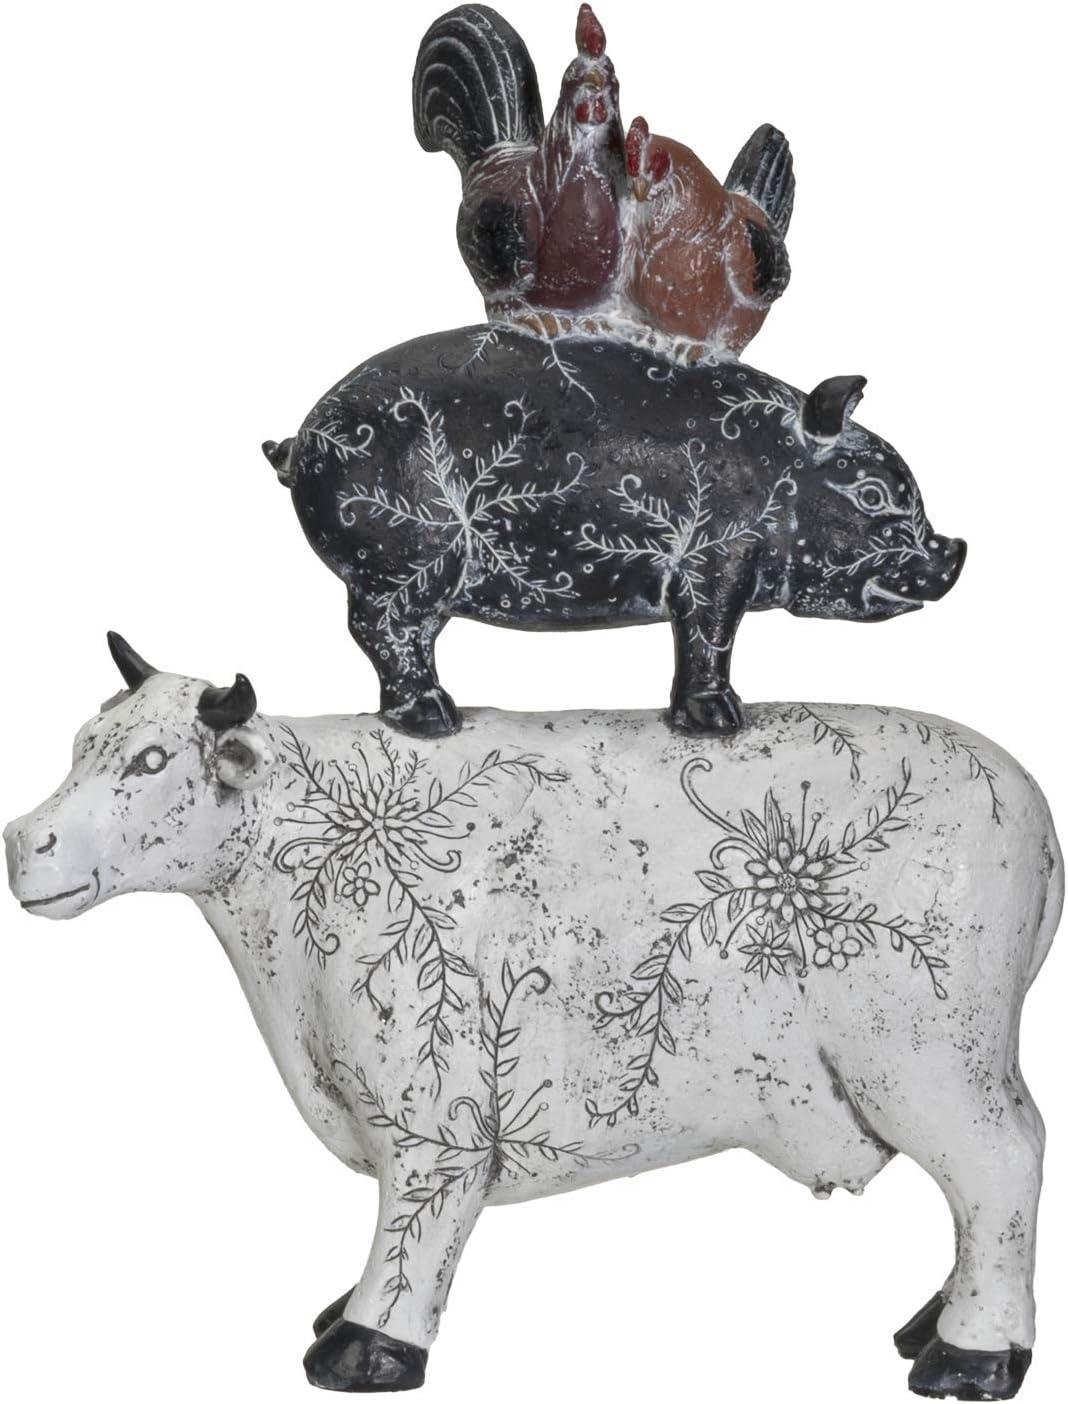 Pacific Giftware American Art Animal Farm Barnyard Stacked Animal Resin Figurine Statue (Cow/Pig/Chicken)